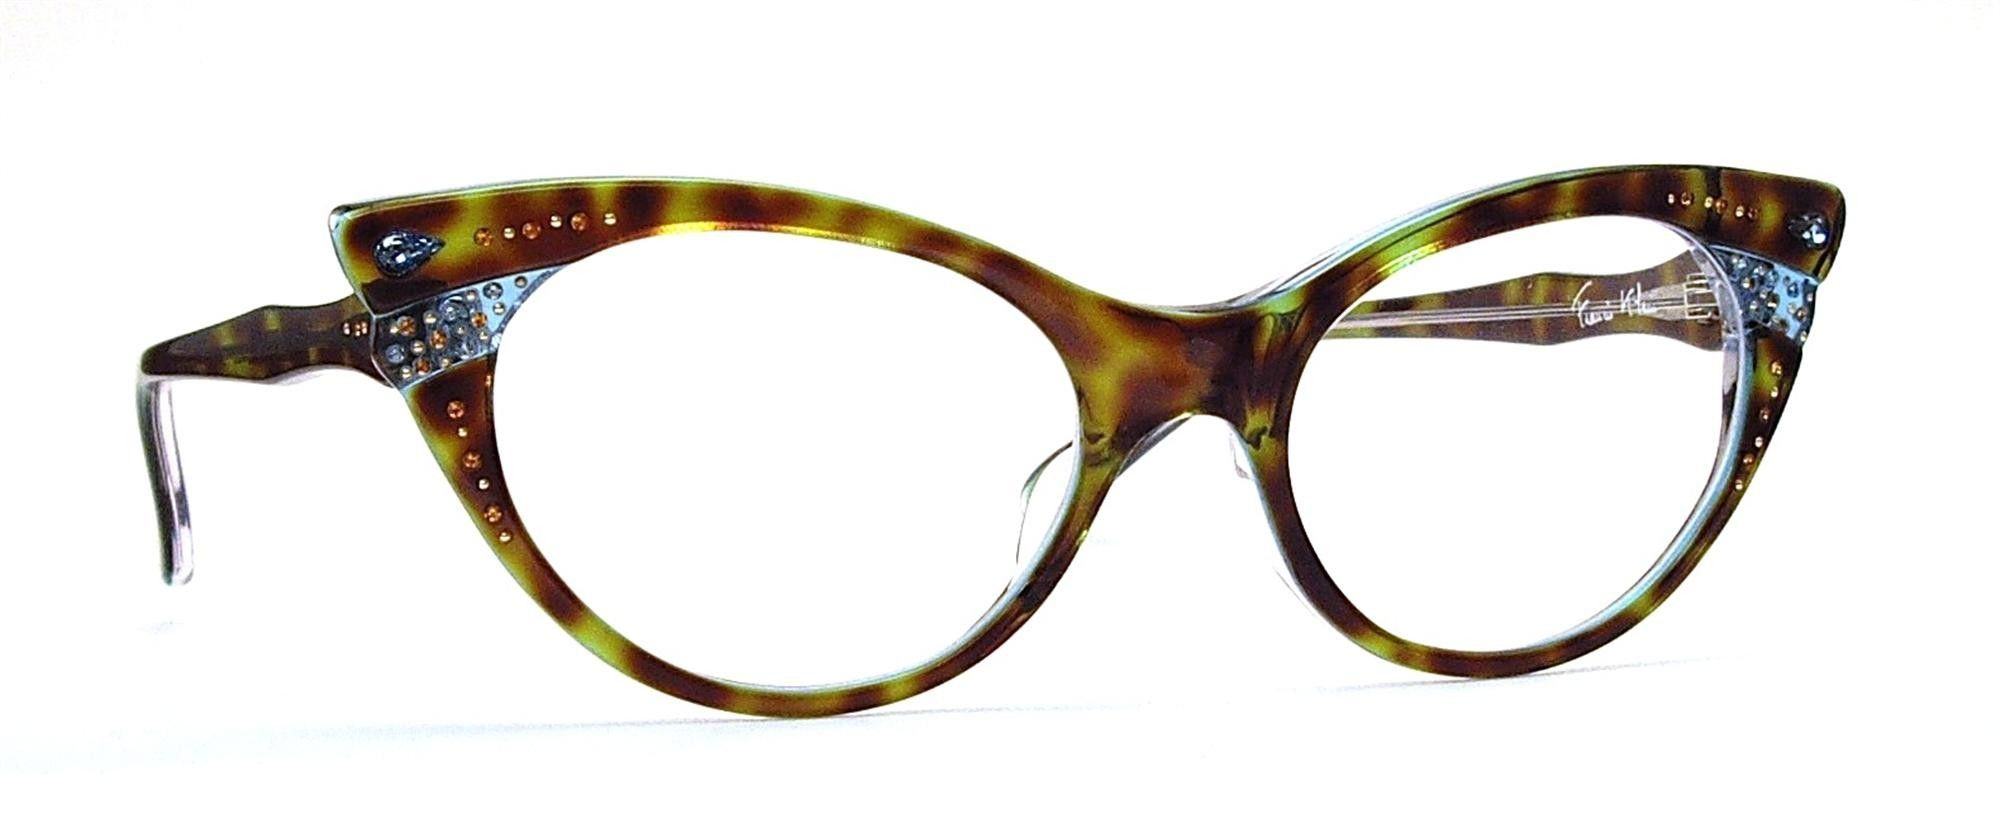 Pin by Shari Guido on Glasses | Pinterest | Glass